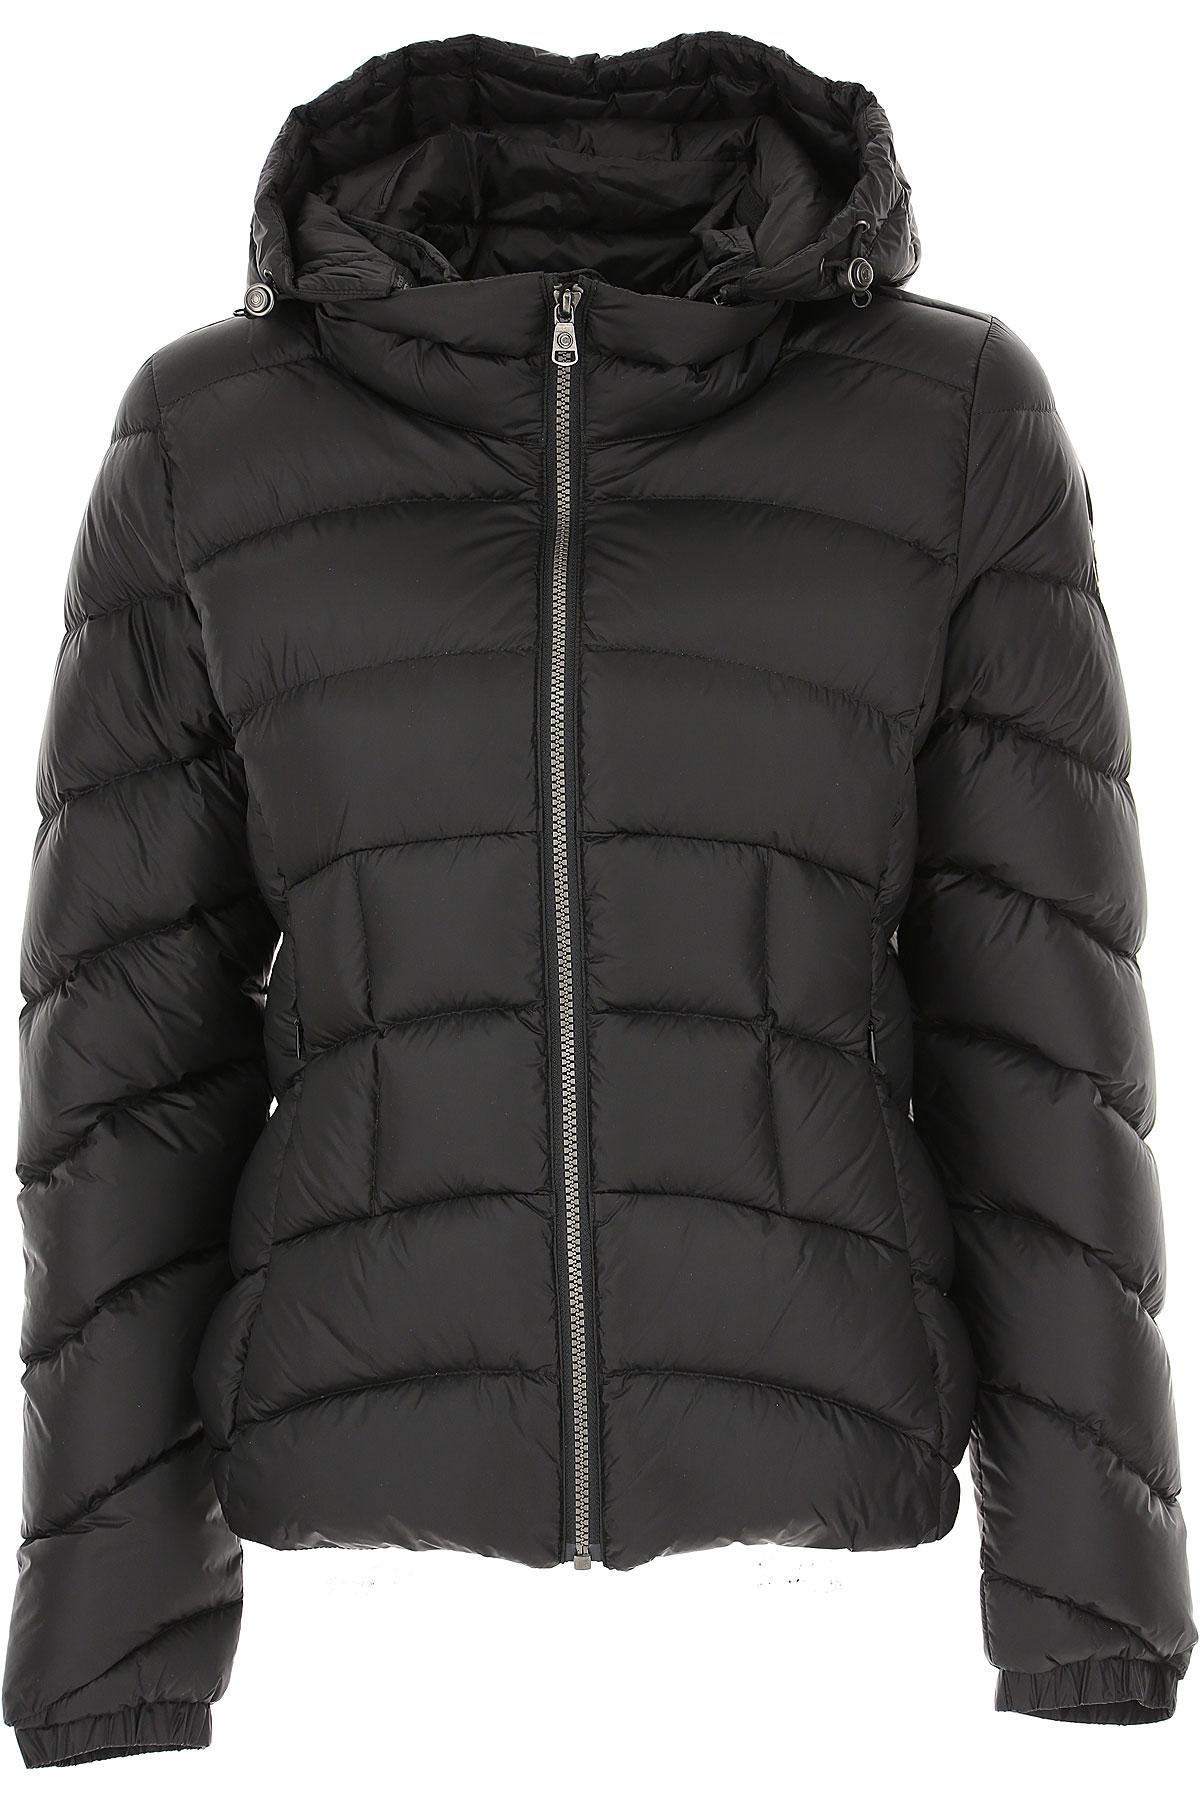 Colmar Down Jacket for Women, Puffer Ski Jacket On Sale, Black, polyamide, 2019, 10 6 8